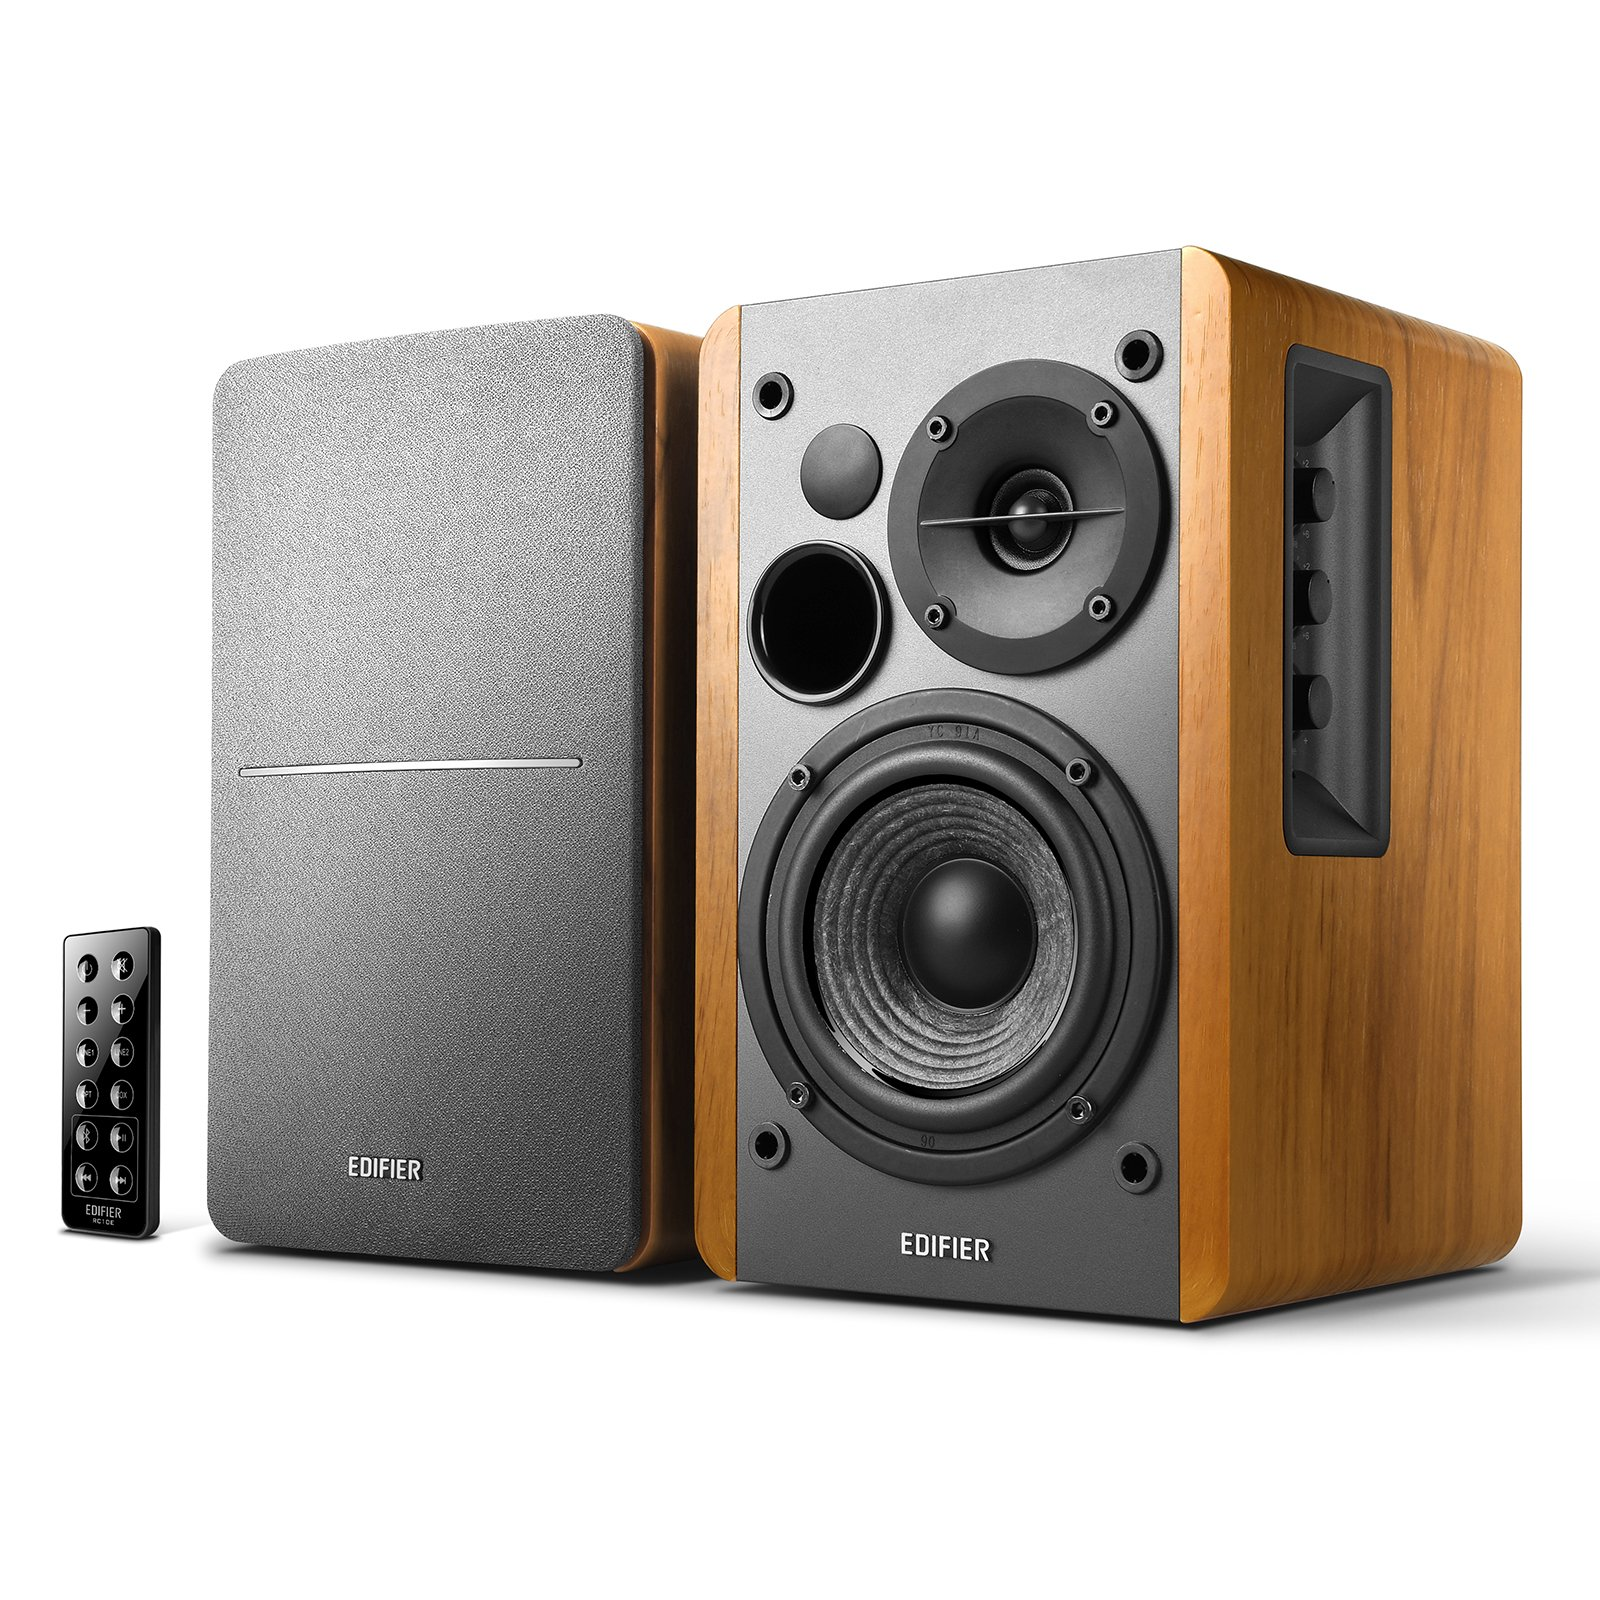 Edifier R1280DB Powered Bluetooth Bookshelf Speakers - Optical Input - Wireless Studio Monitors - 4 Inch Near Field Speaker - 42w RMS - Wood Grain (Certified Refurbished)